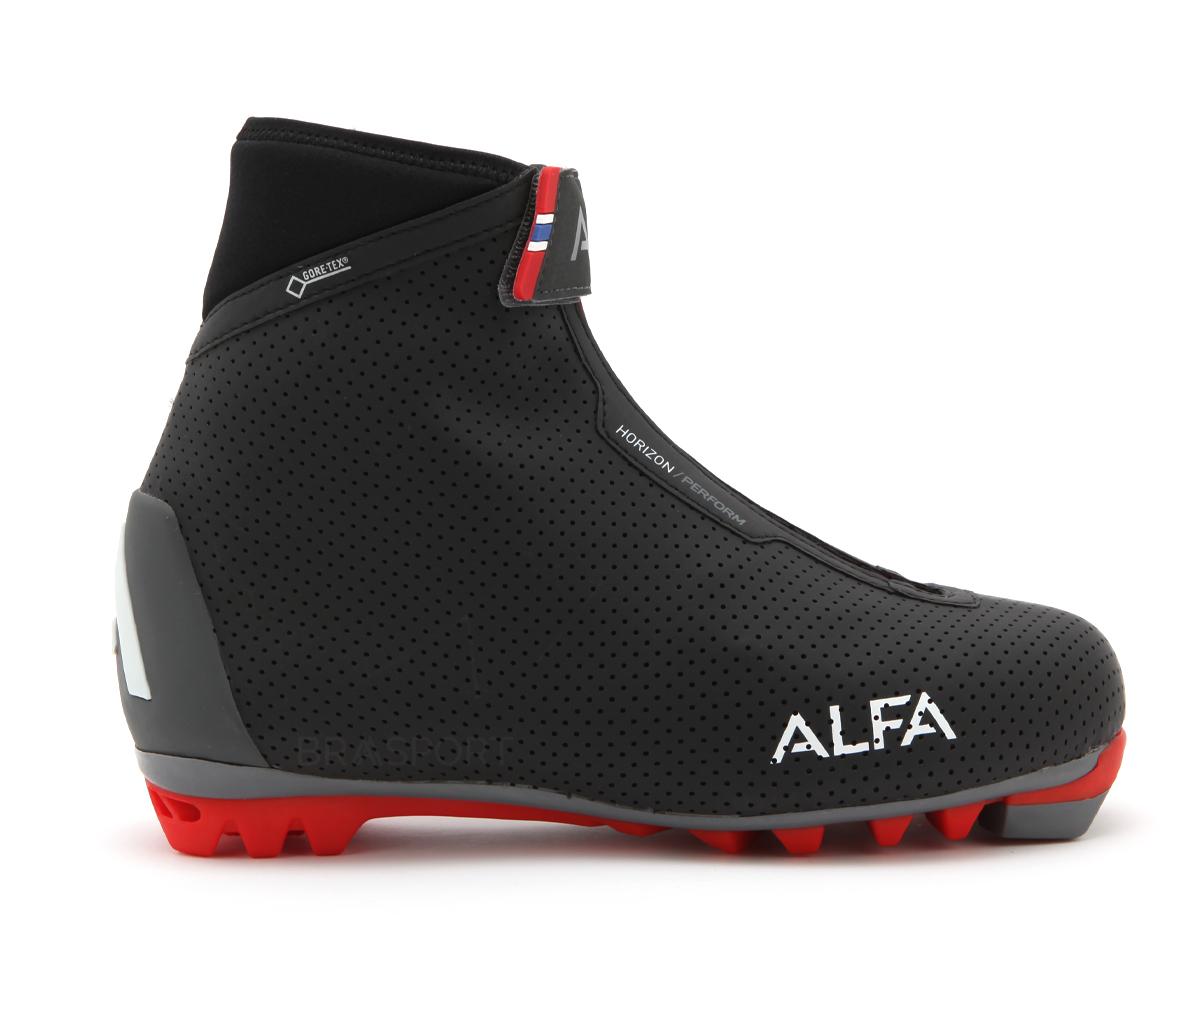 Alfa Perform GTX 18:19.jpg